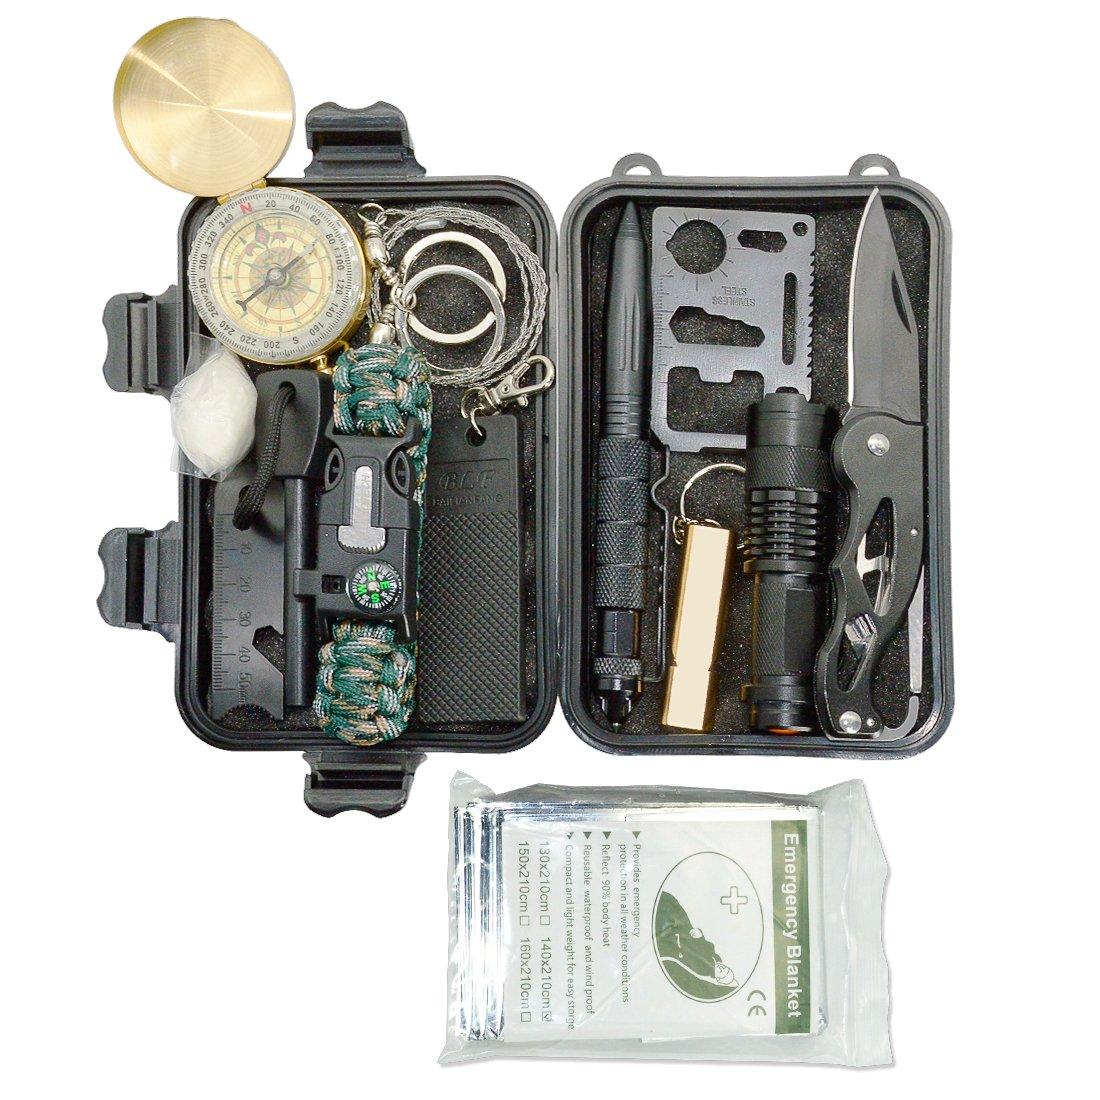 LeMotech Kit de supervivencia de emergencia 13 en 1, kit de ...